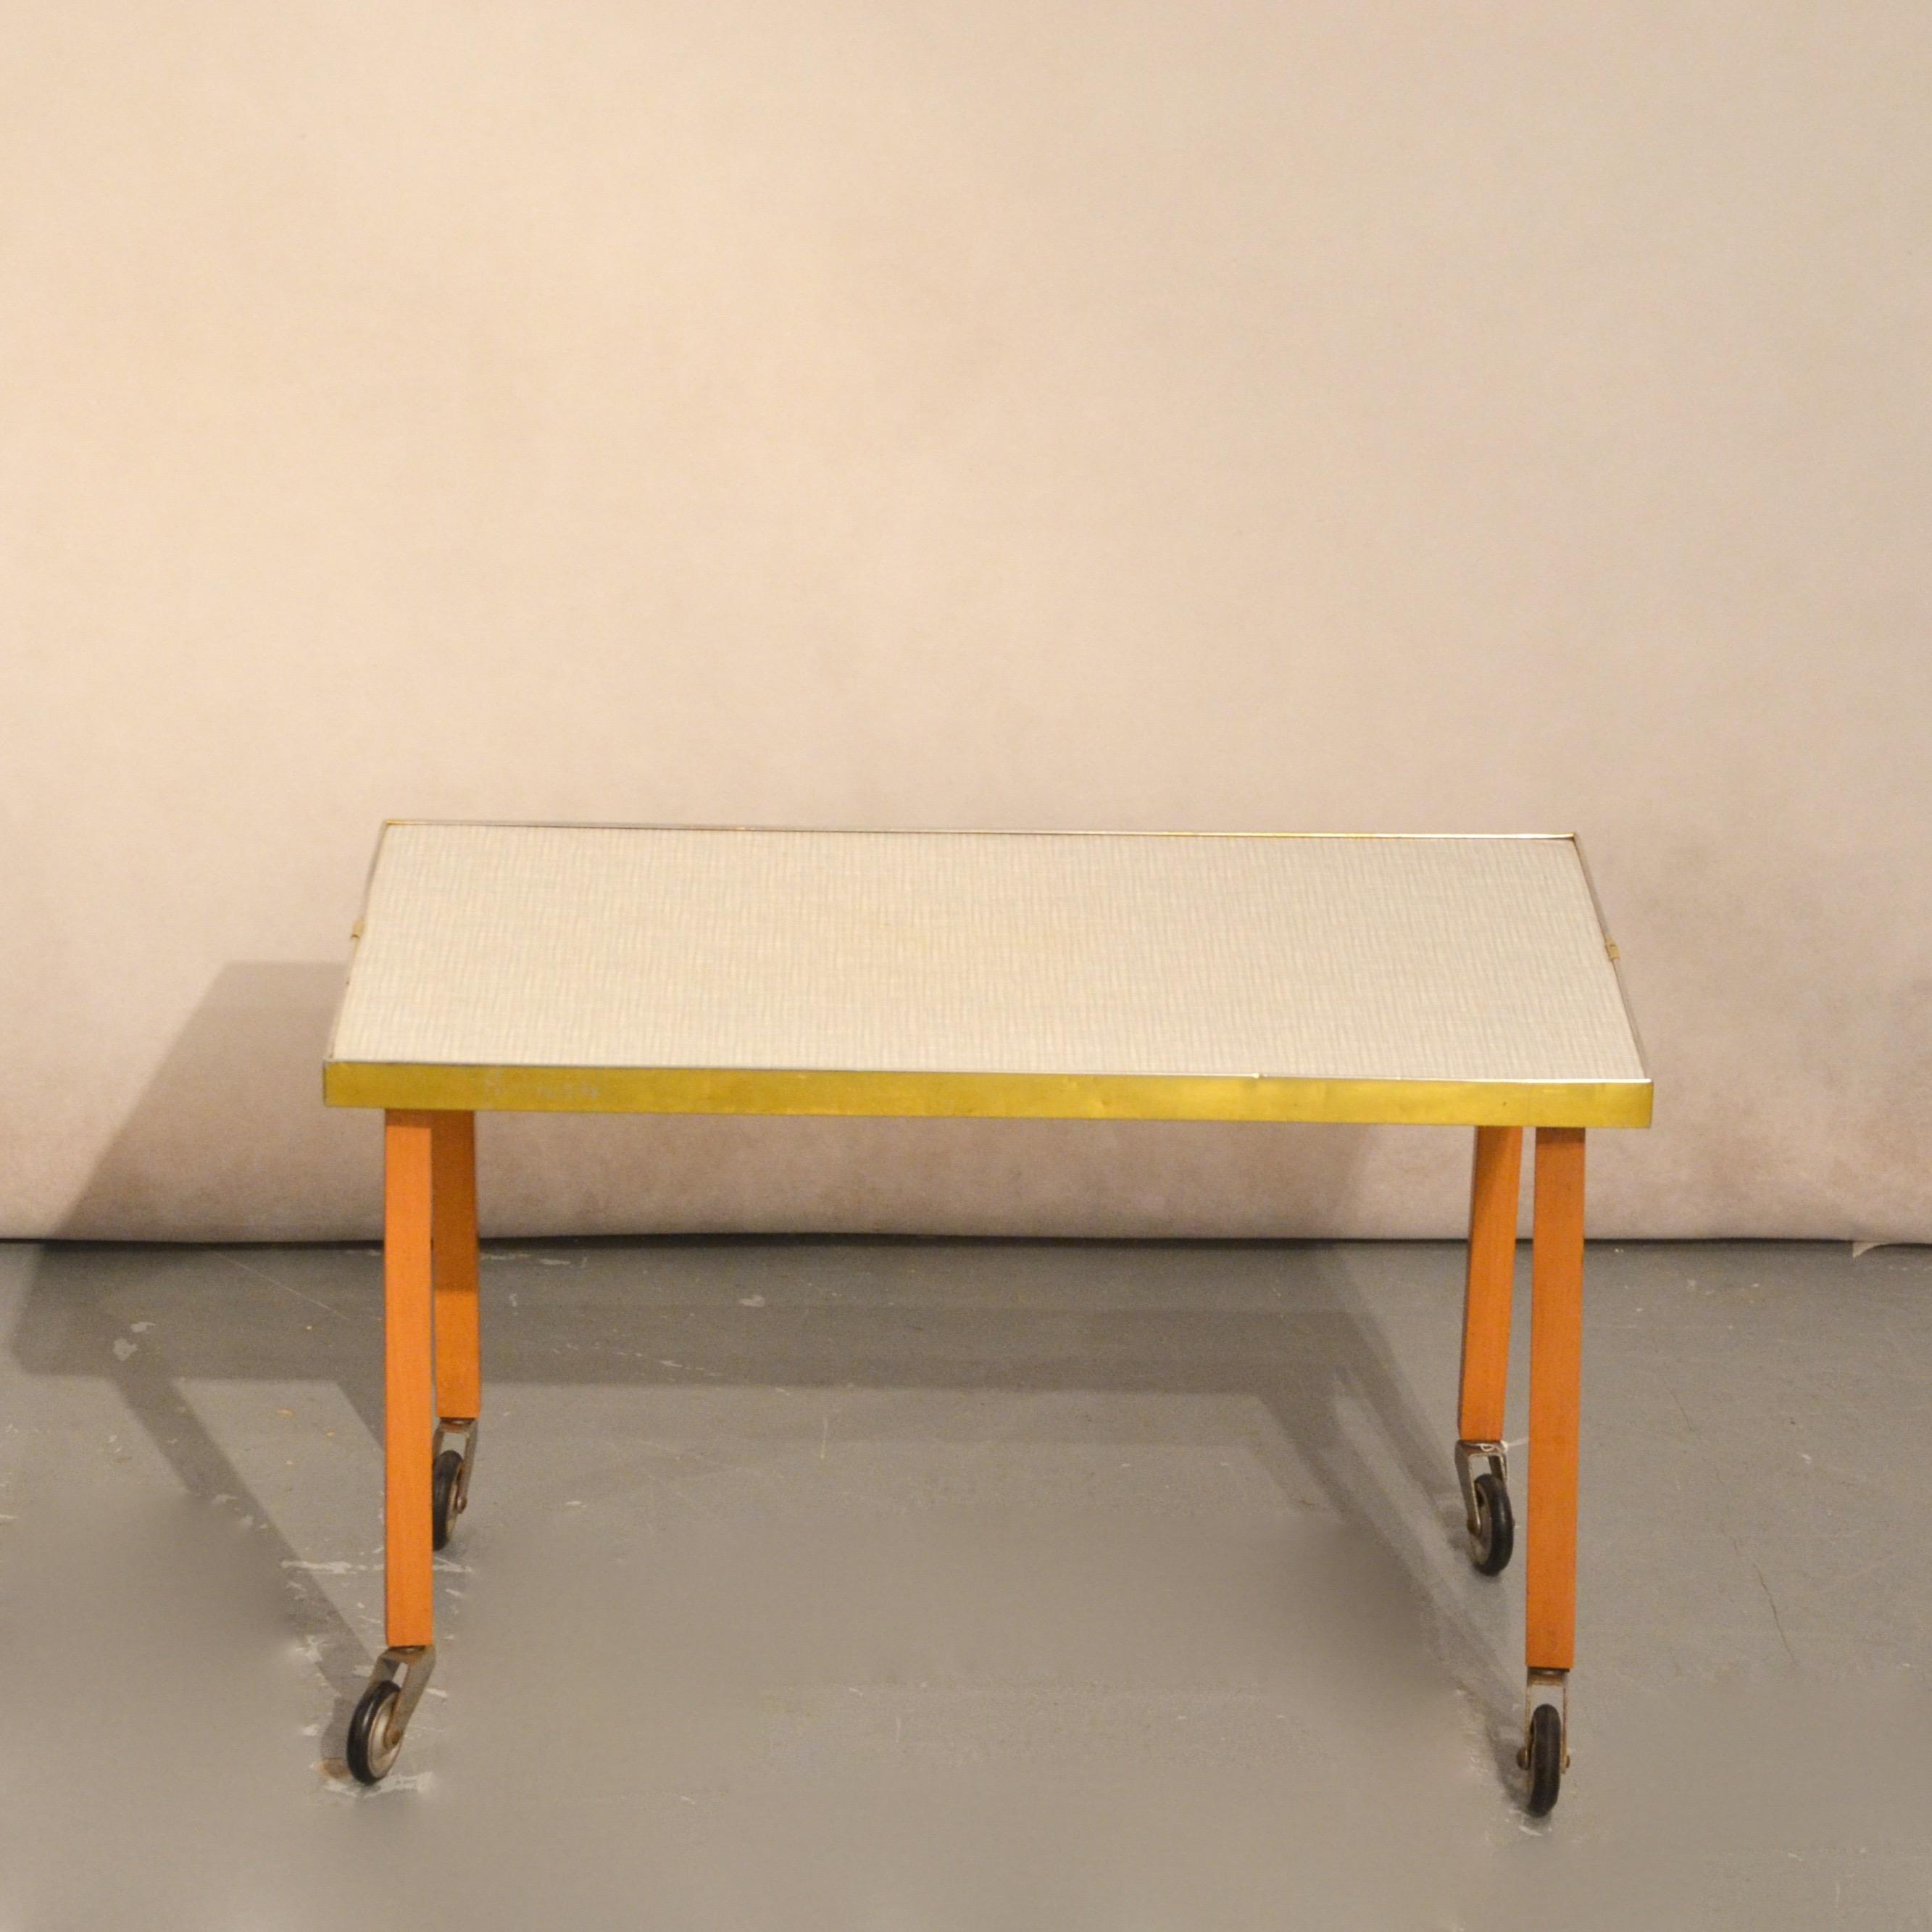 Petite Table D Appoint Roulettes Bindies